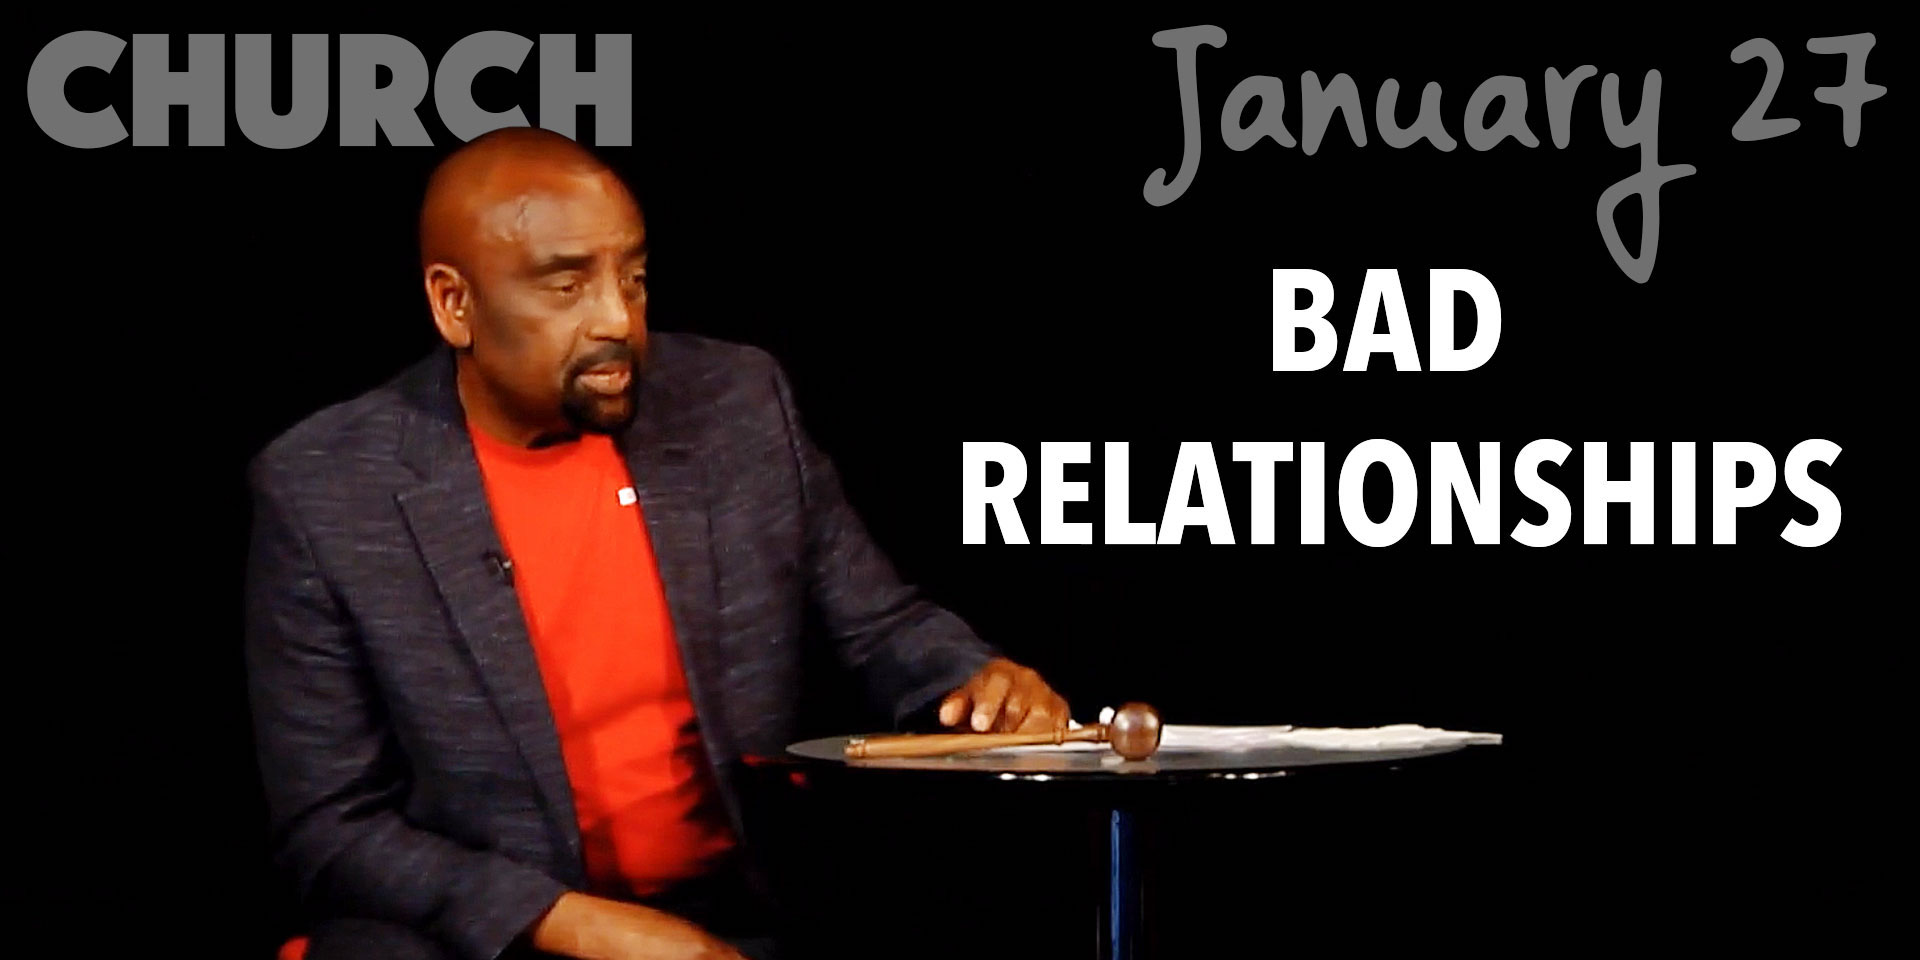 Church Jan 27, 2018: Bad Relationships